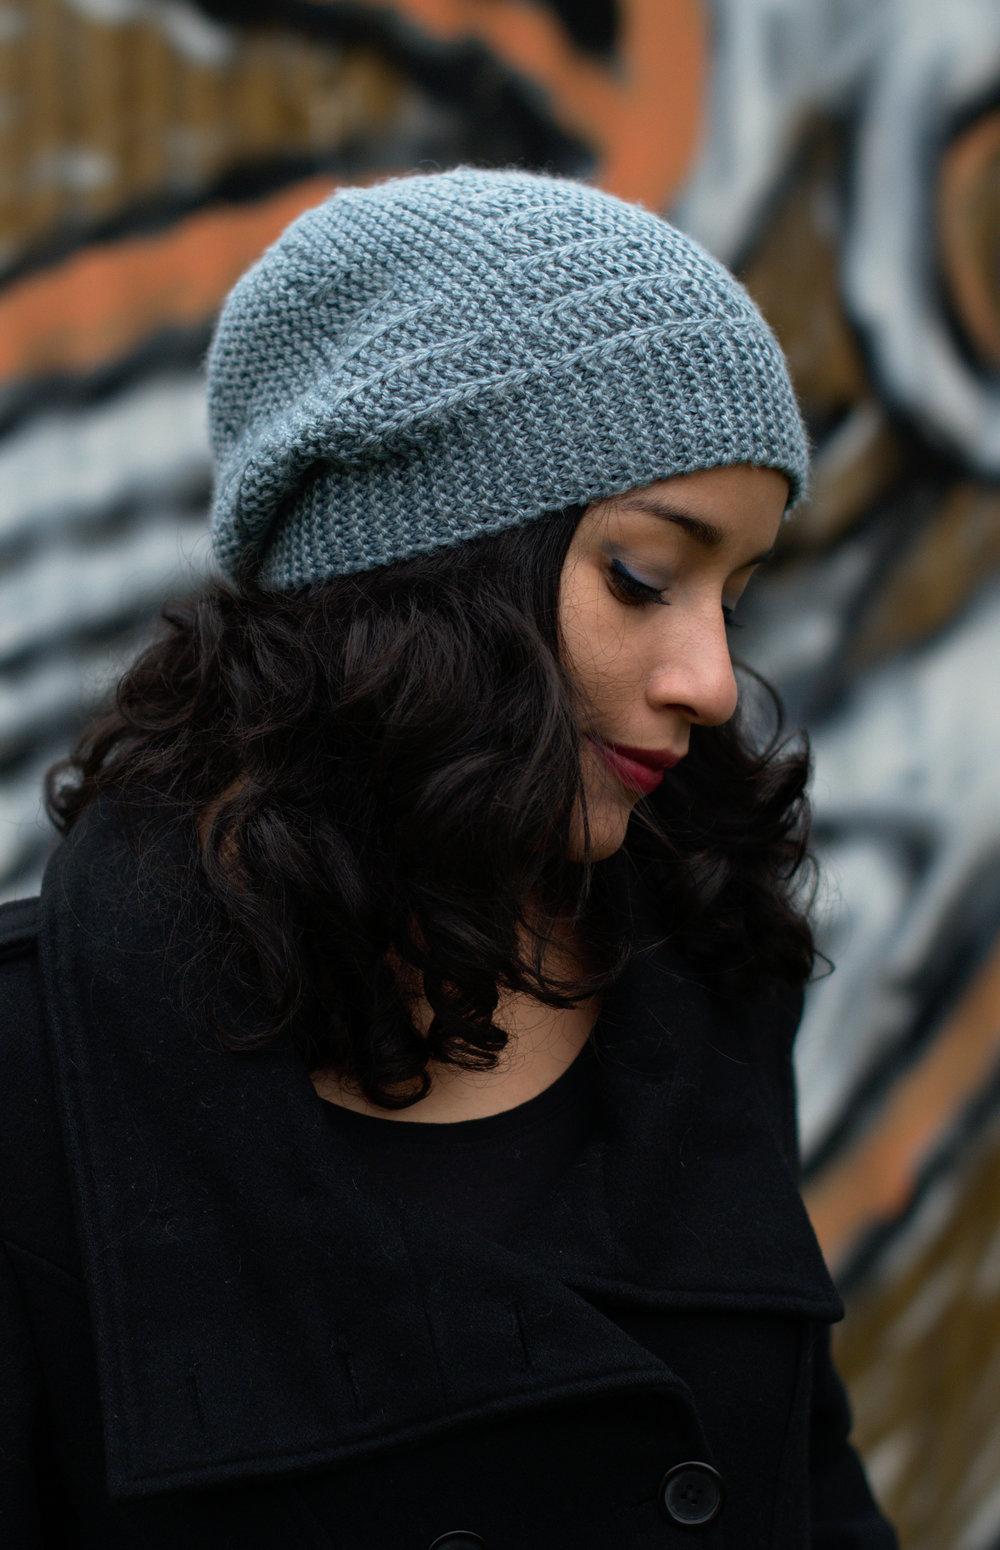 Ruschia sideways knit hand knitting pattern for hand dyed aran weight wool yarn